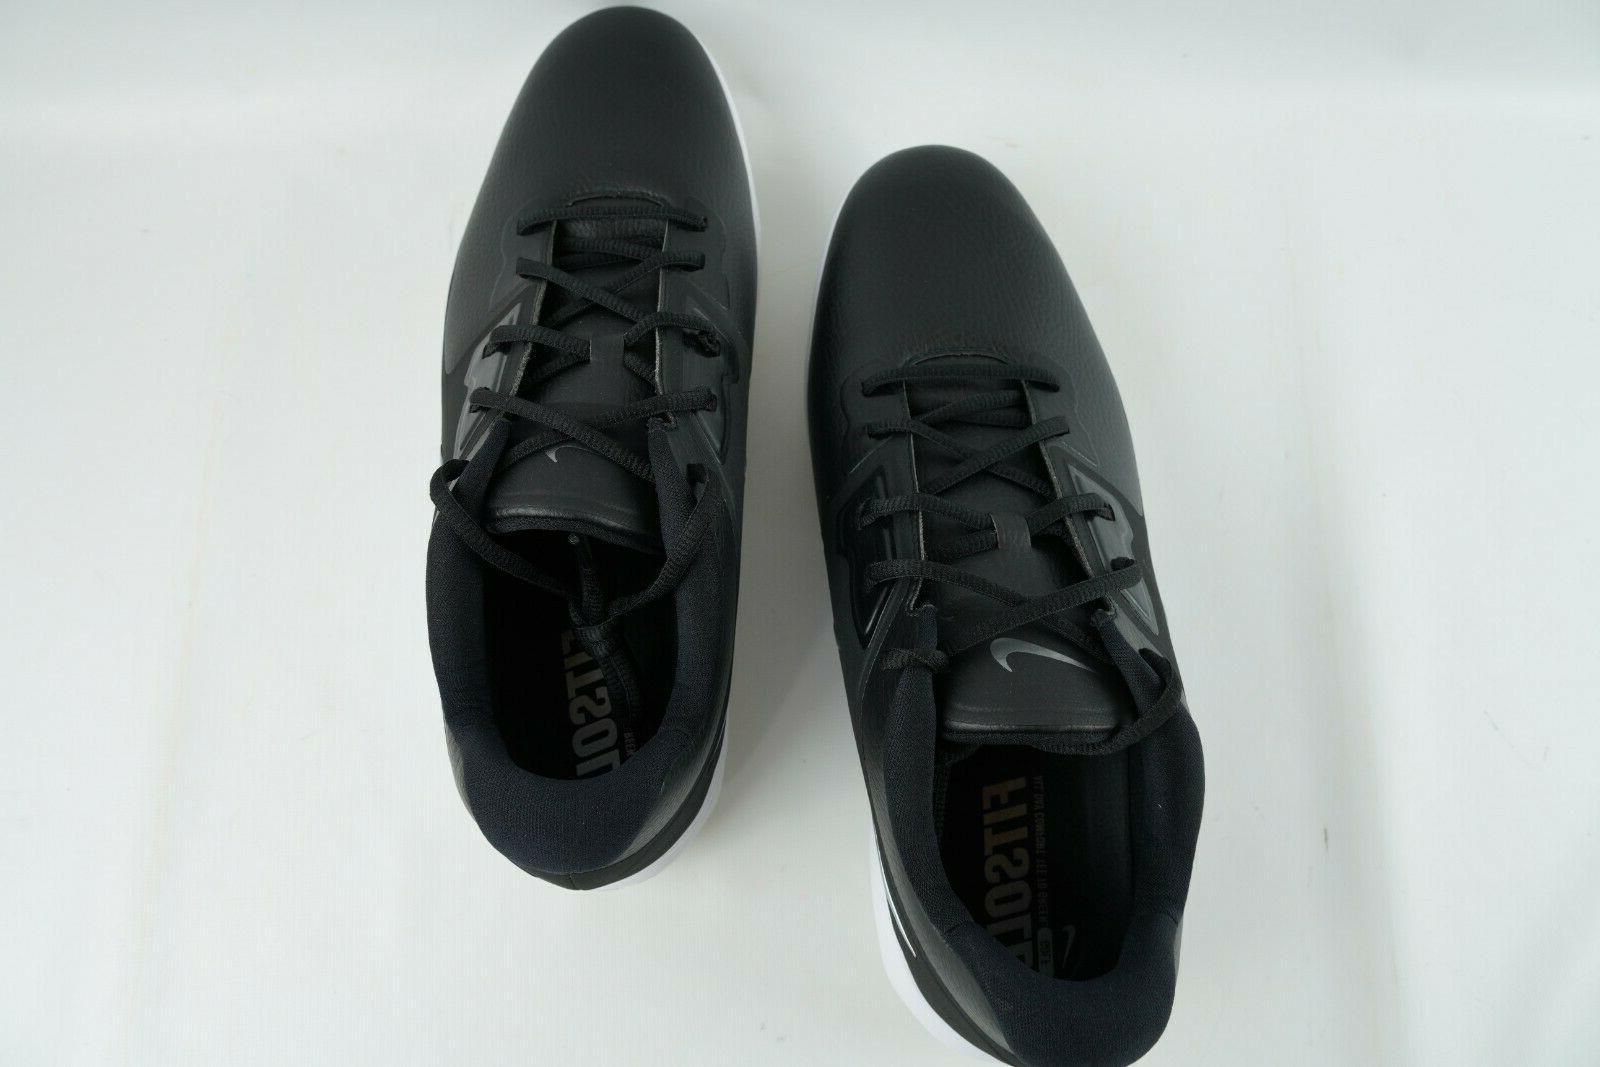 Nike Shoes Black White AQ2197-001 Men's Size